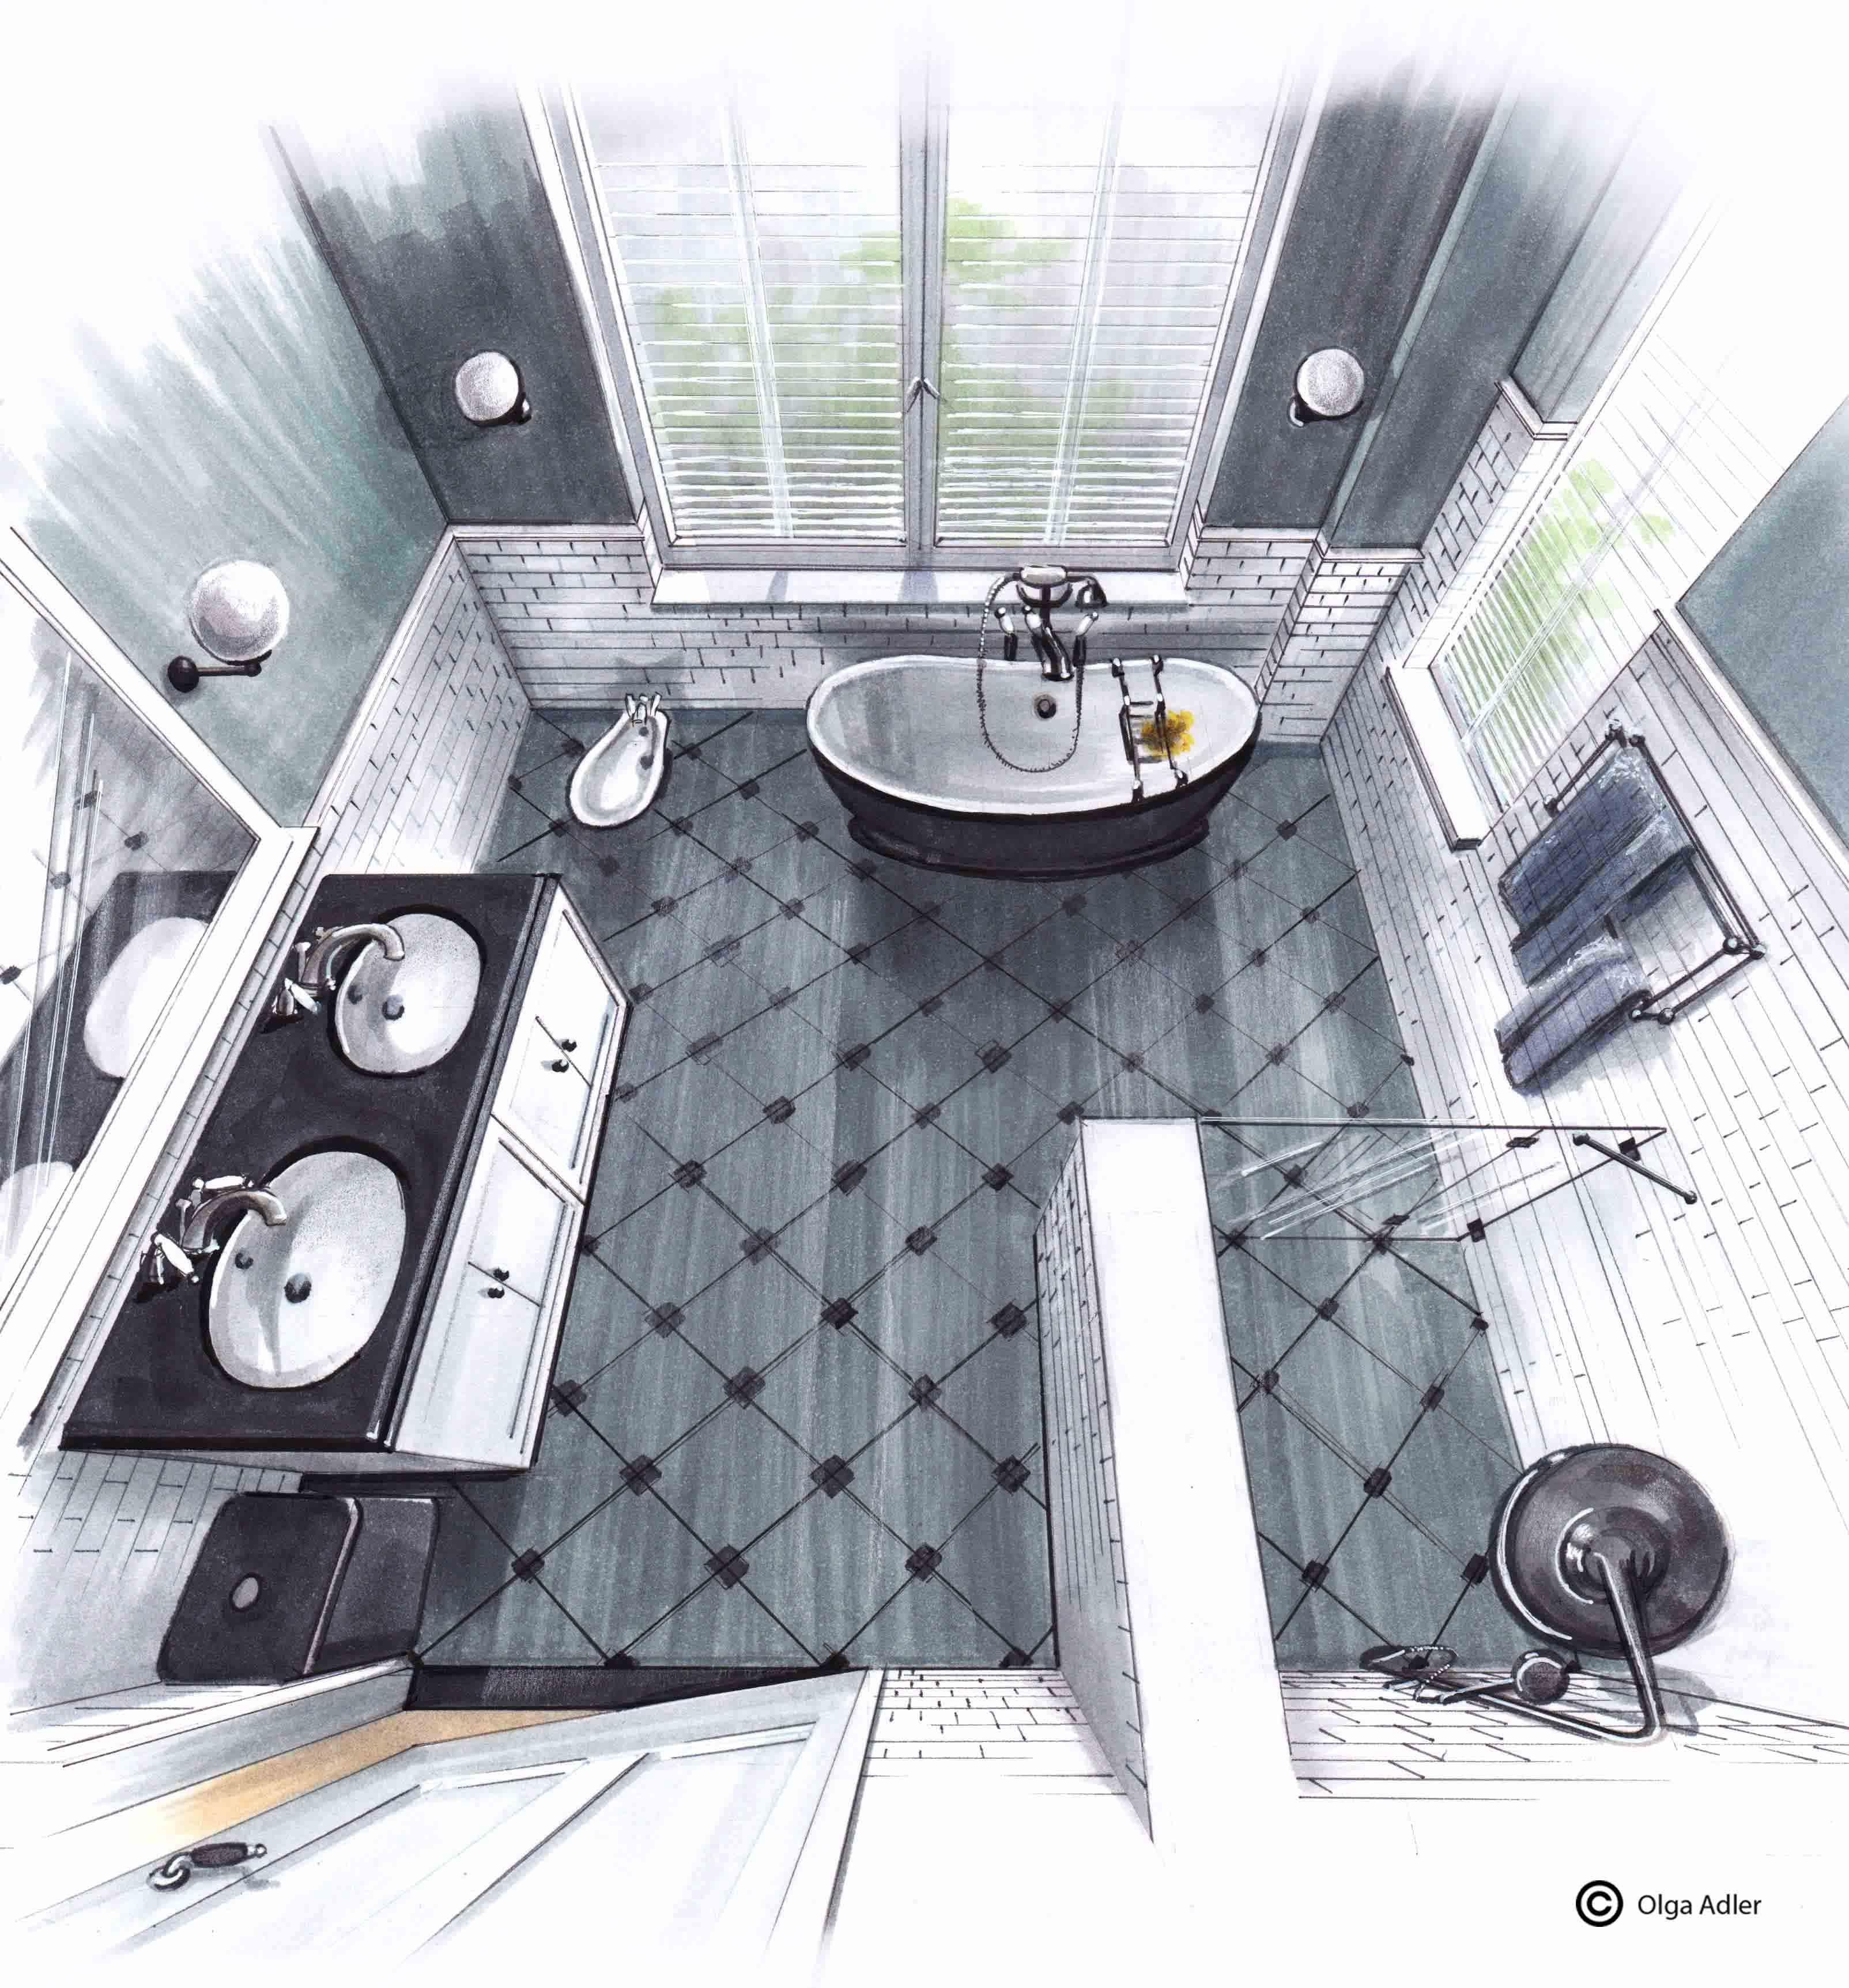 Badkamer Olga Adler van boven af 3D perspectief